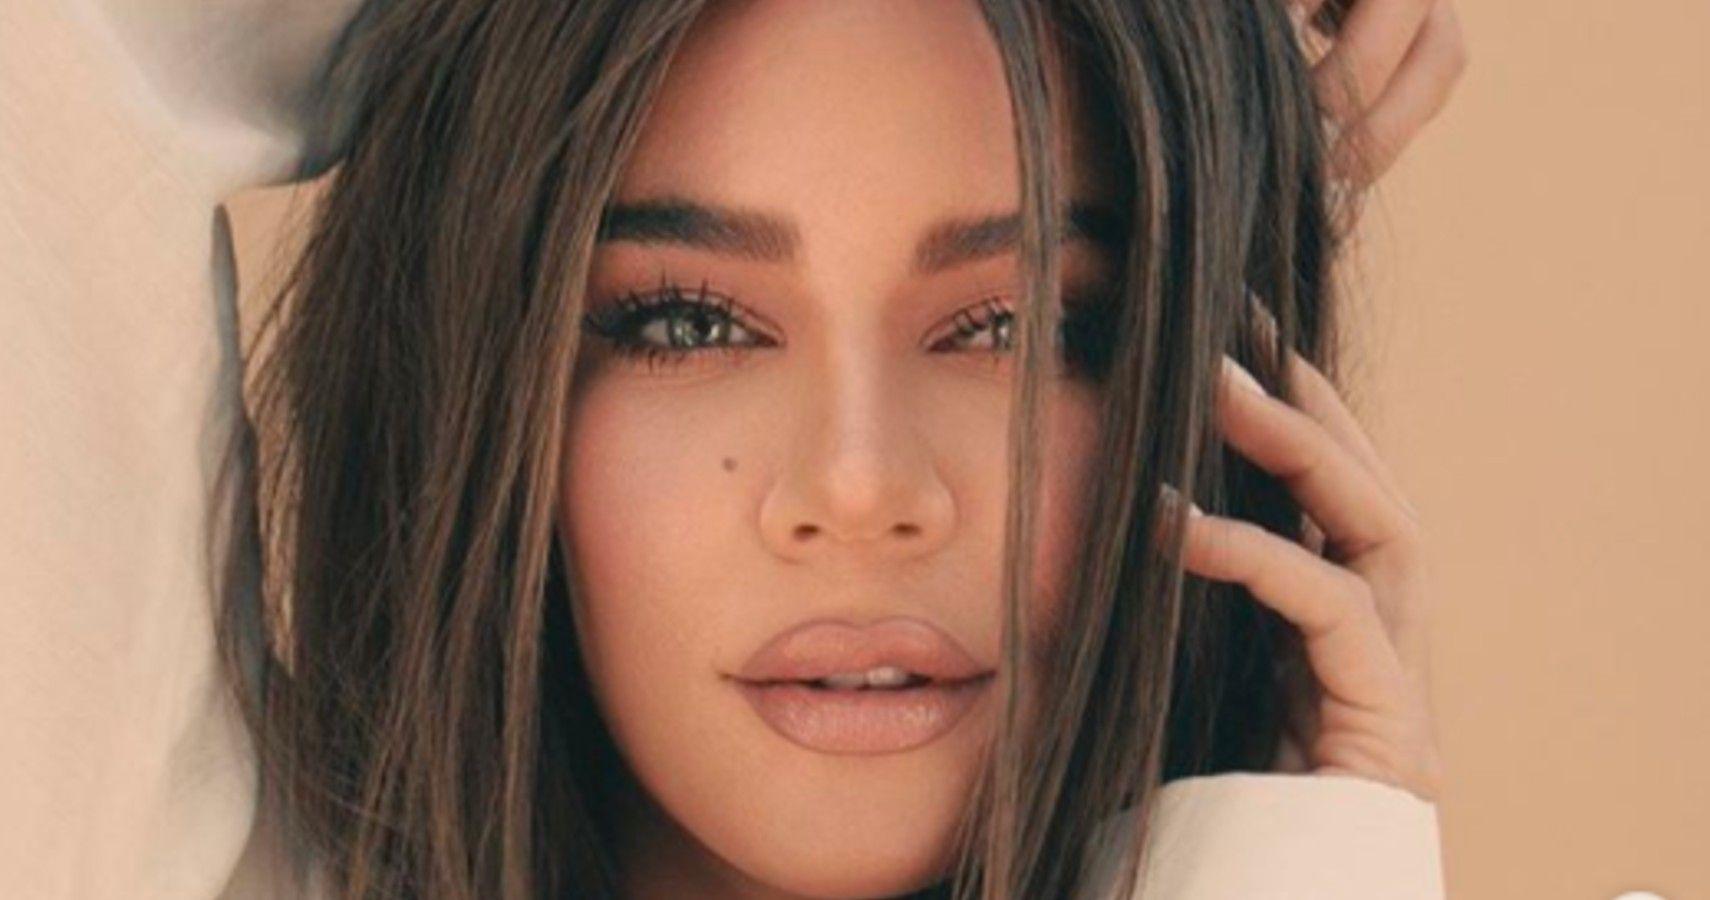 Khloe Kardashian Brings Up Tristan's Cheating Past | Moms.com